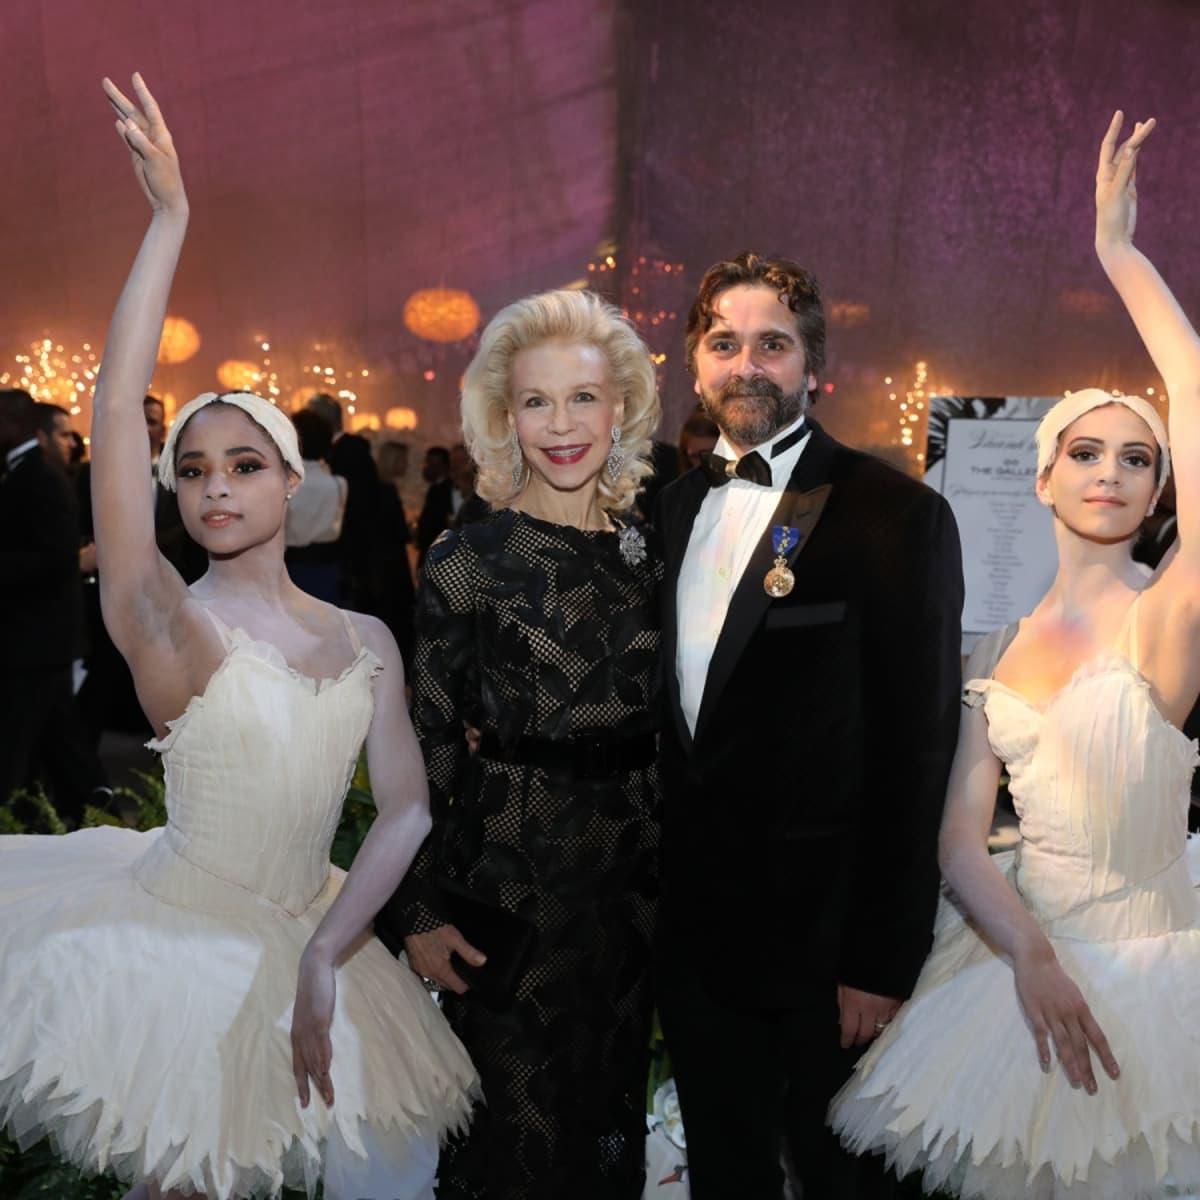 Houston, Ballet Ball, February 2018, Lynn Wyatt, Stanton Welch AM